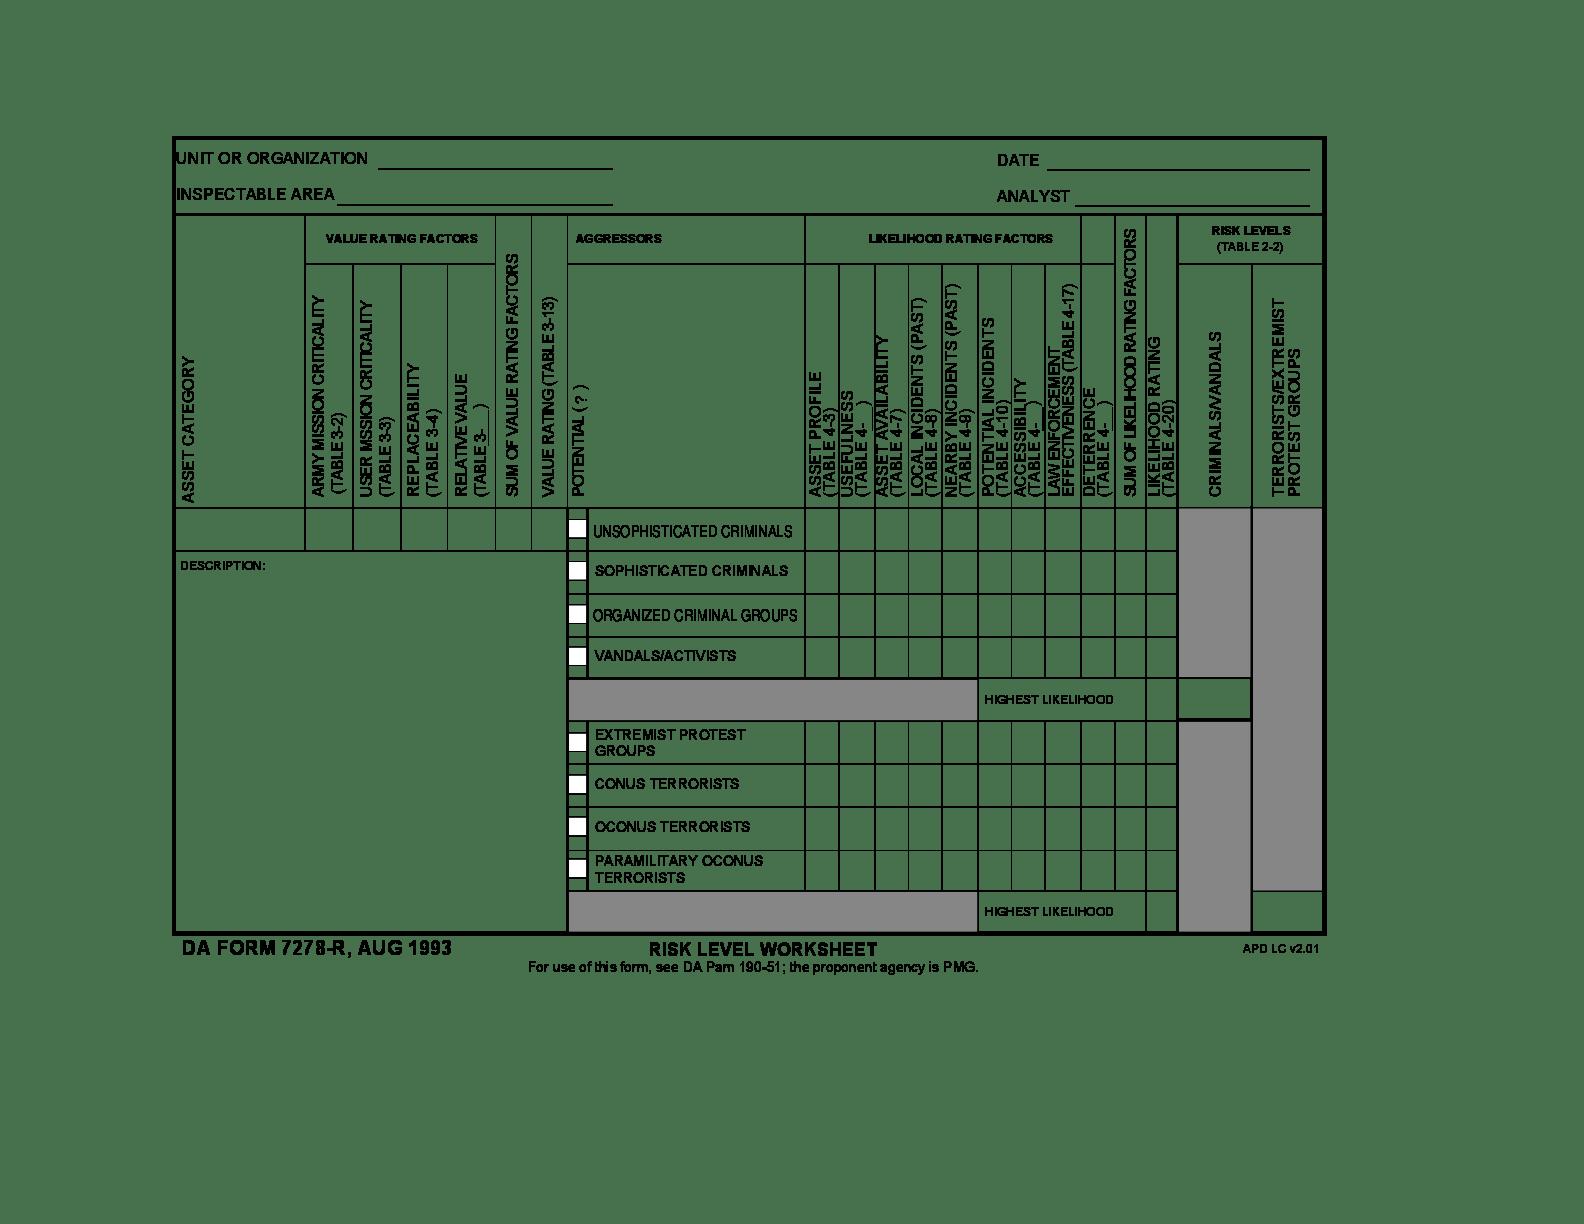 Da Form R Instructions